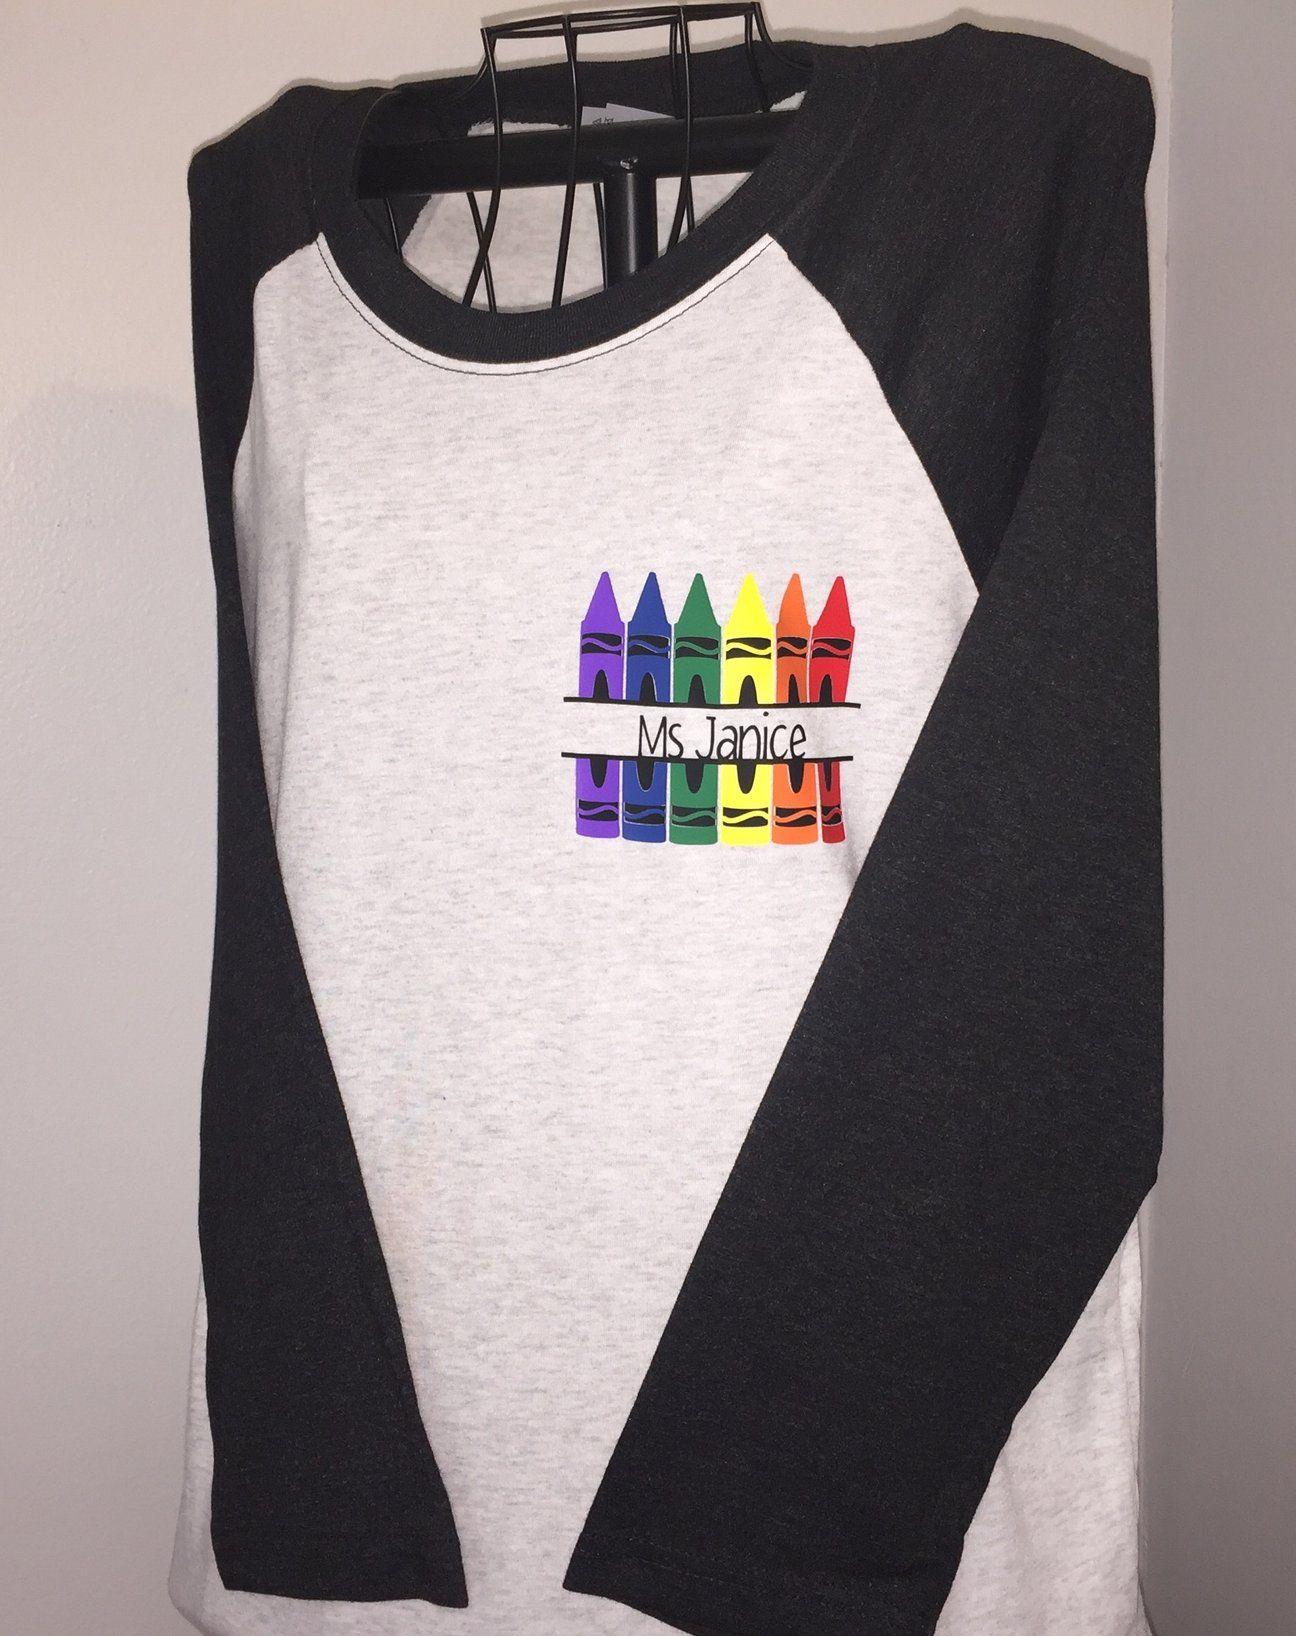 765ca39b6 Teacher Name in Crayons Personalized Split Monogram Adult Unisex Triblend  Baseball Style Raglan Shirt